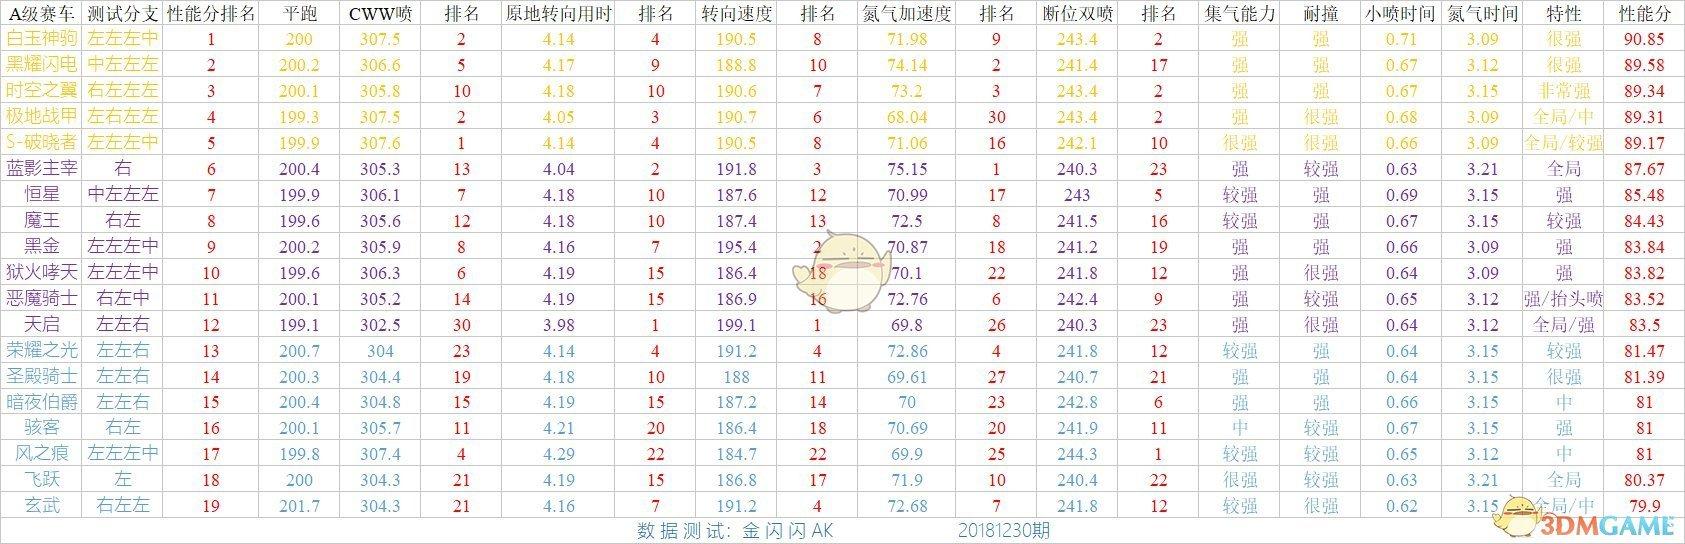 《QQ飞车》手游A车最新排行榜